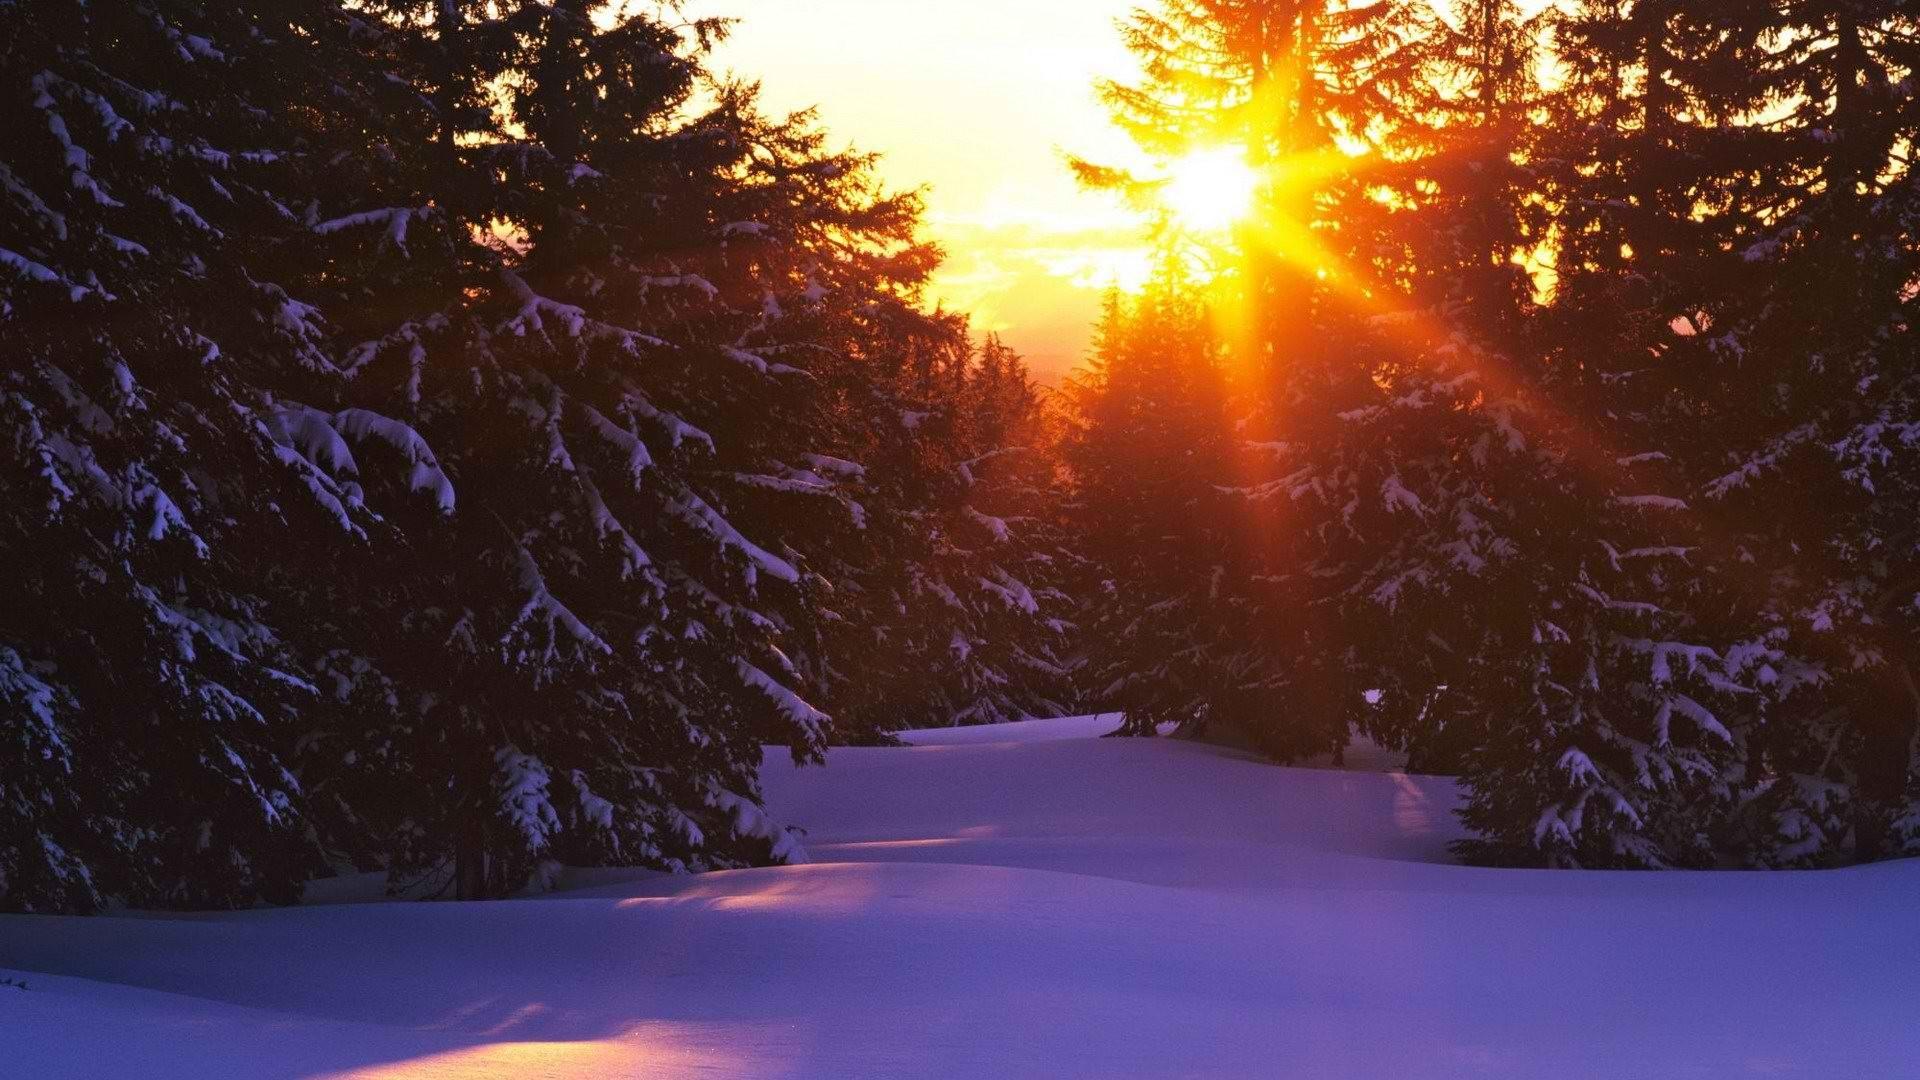 яркое зимнее солнце гиф картинки родовой